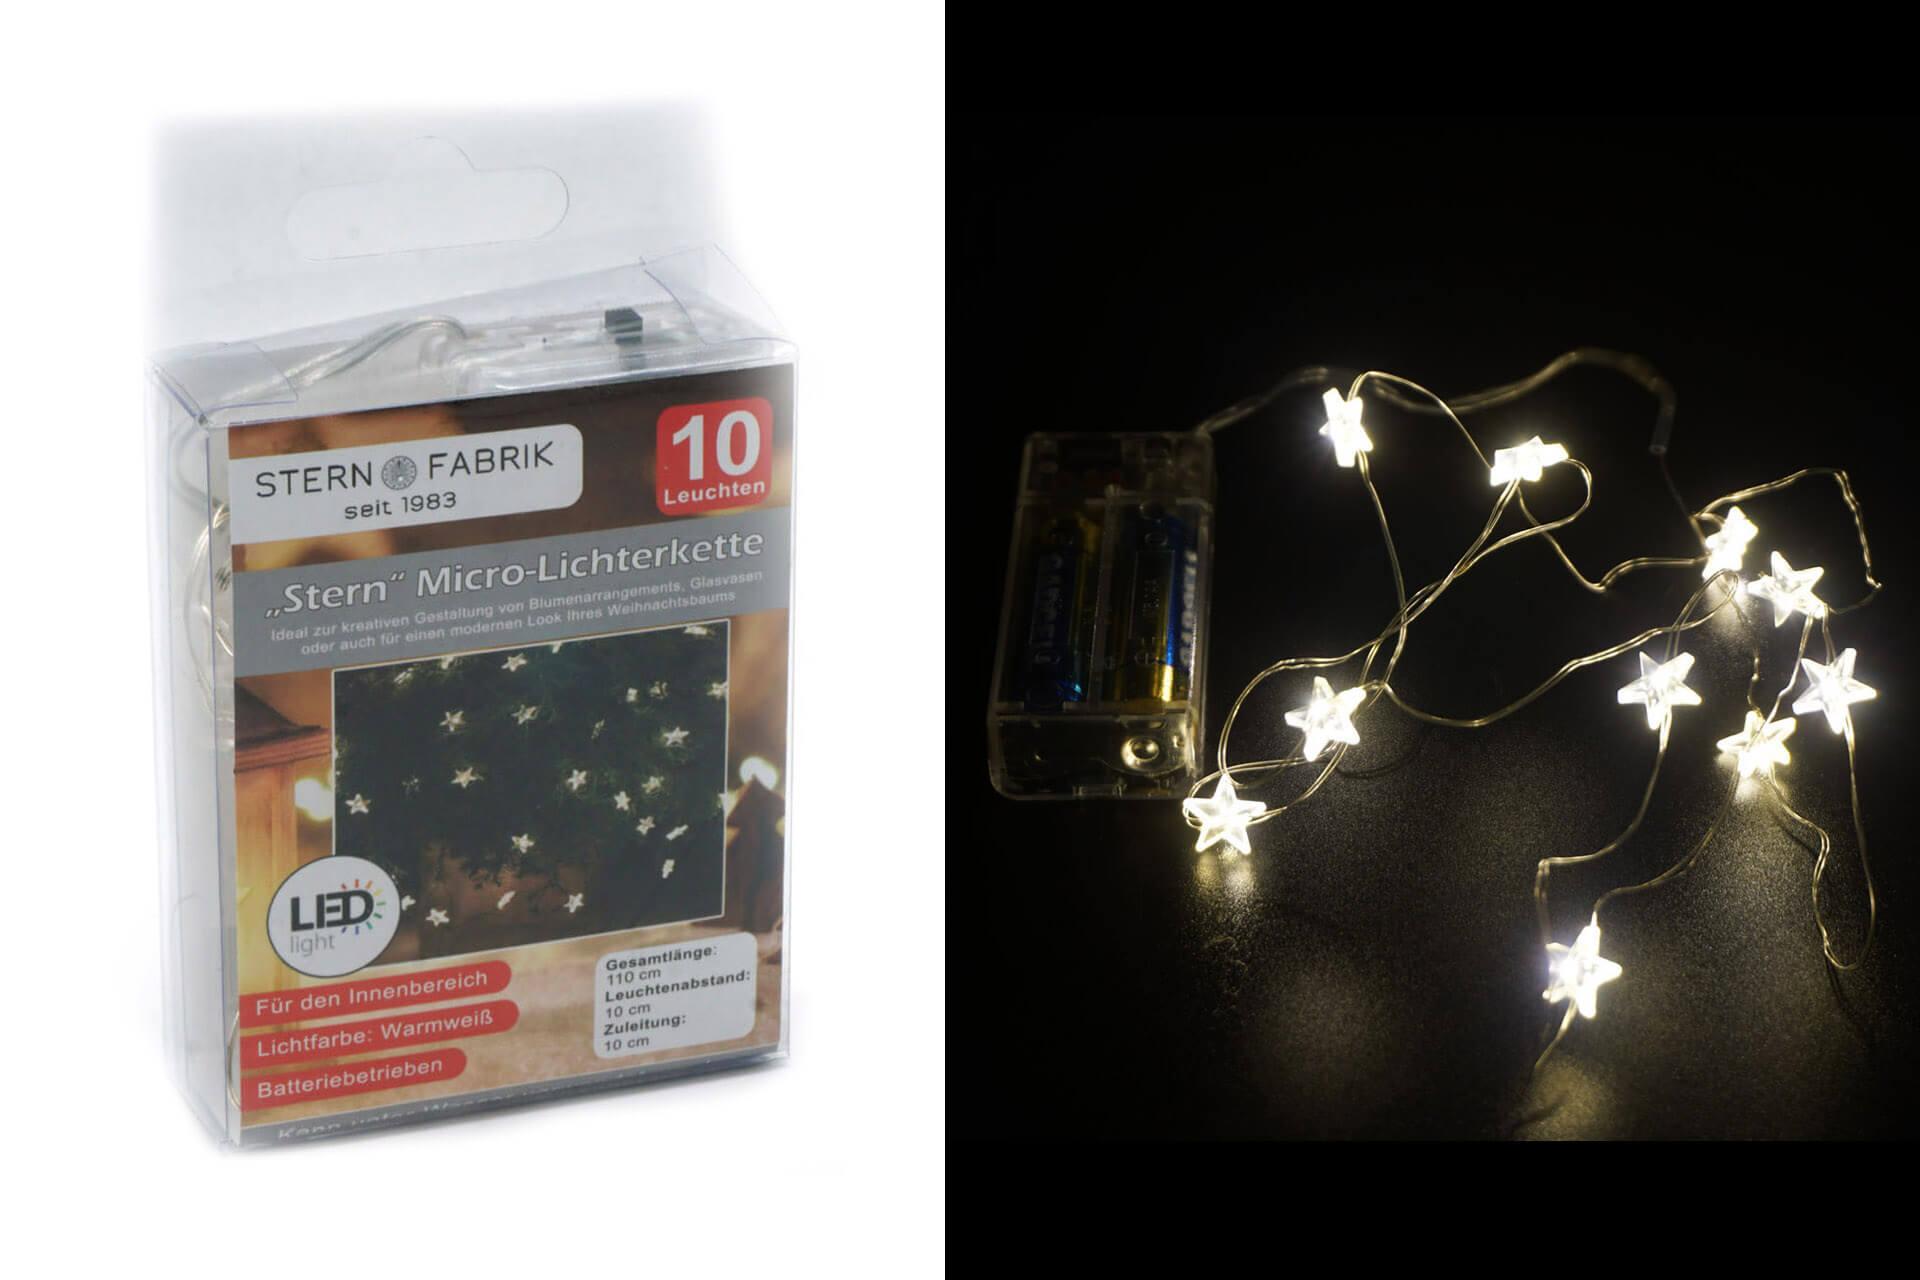 LED Lichterkette Sternen Mikro, 10 Mikro-LED 105cm warmweiß